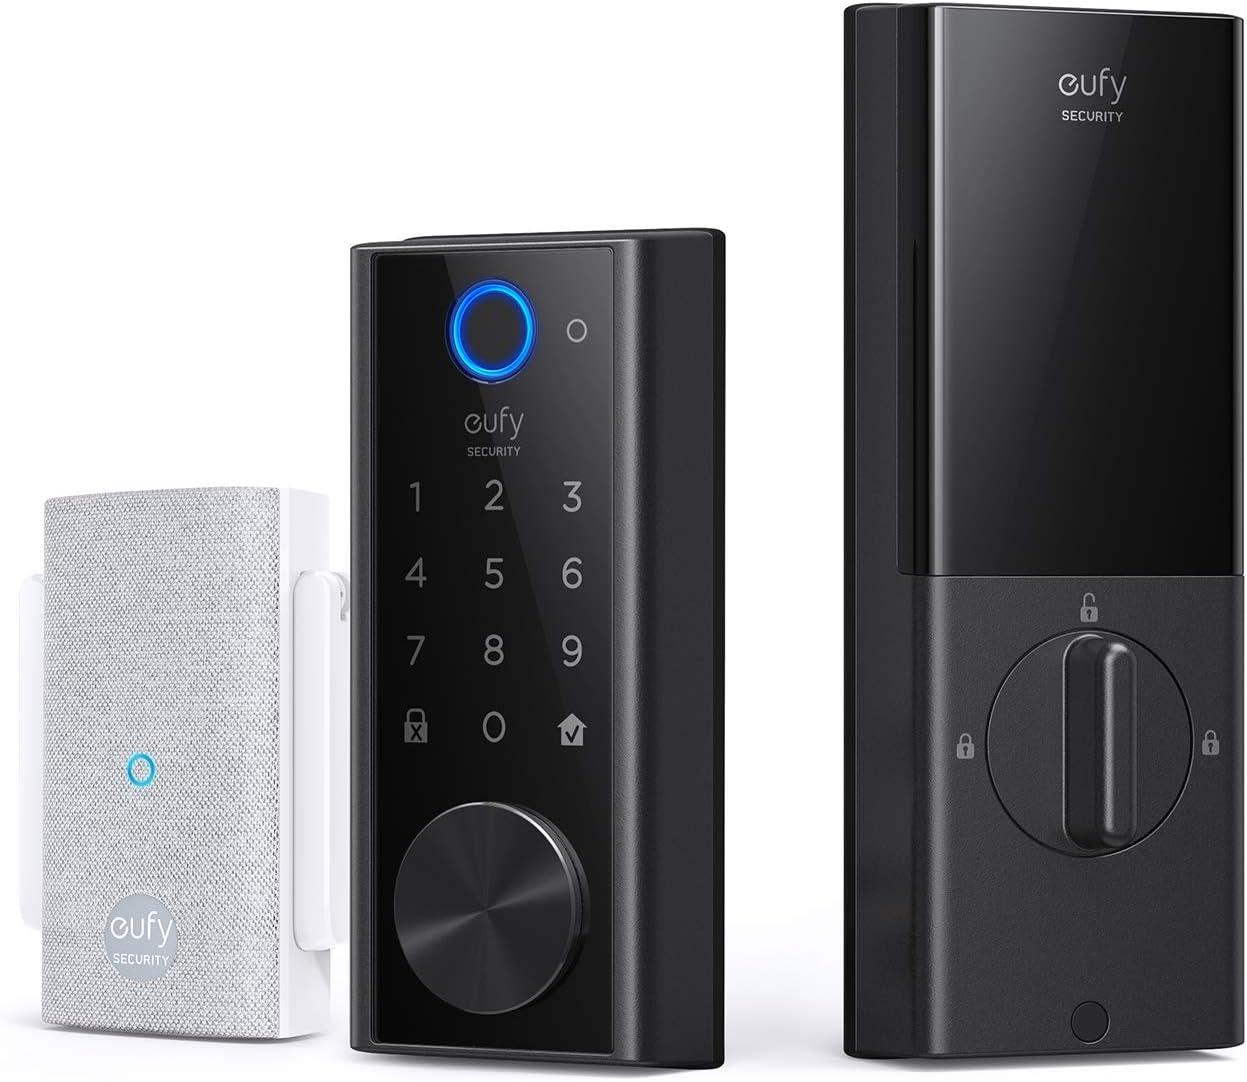 eufy Security Smart Lock Touch, Remotely Control with Wi-Fi Bridge, Fingerprint Keyless Entry Door Lock, Bluetooth Electronic Deadbolt, Touchscreen Keypad, BHMA Certified, IP65 Weatherproof